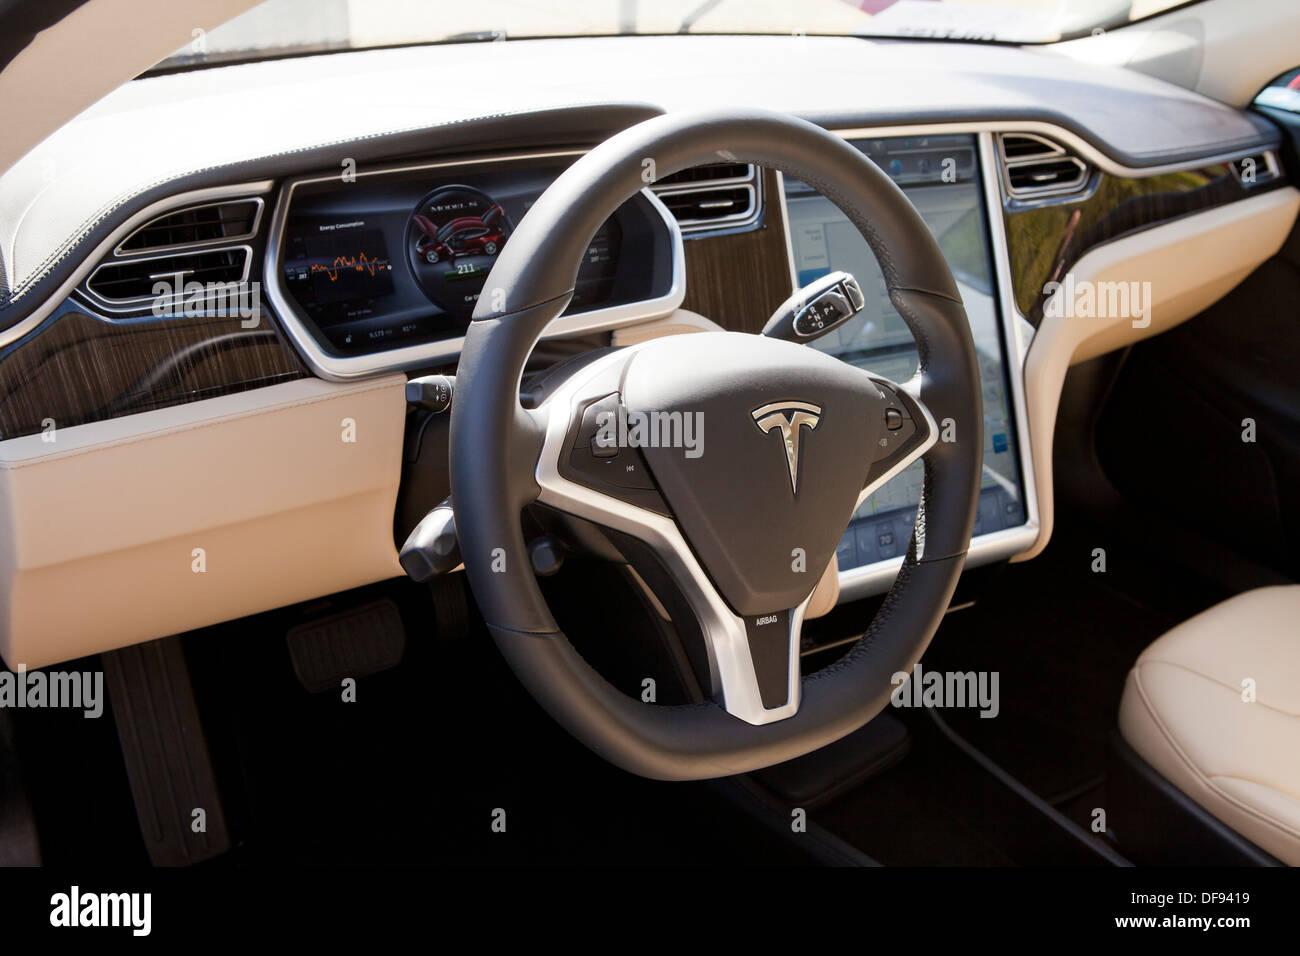 Tesla Model S electric car interior - Stock Image